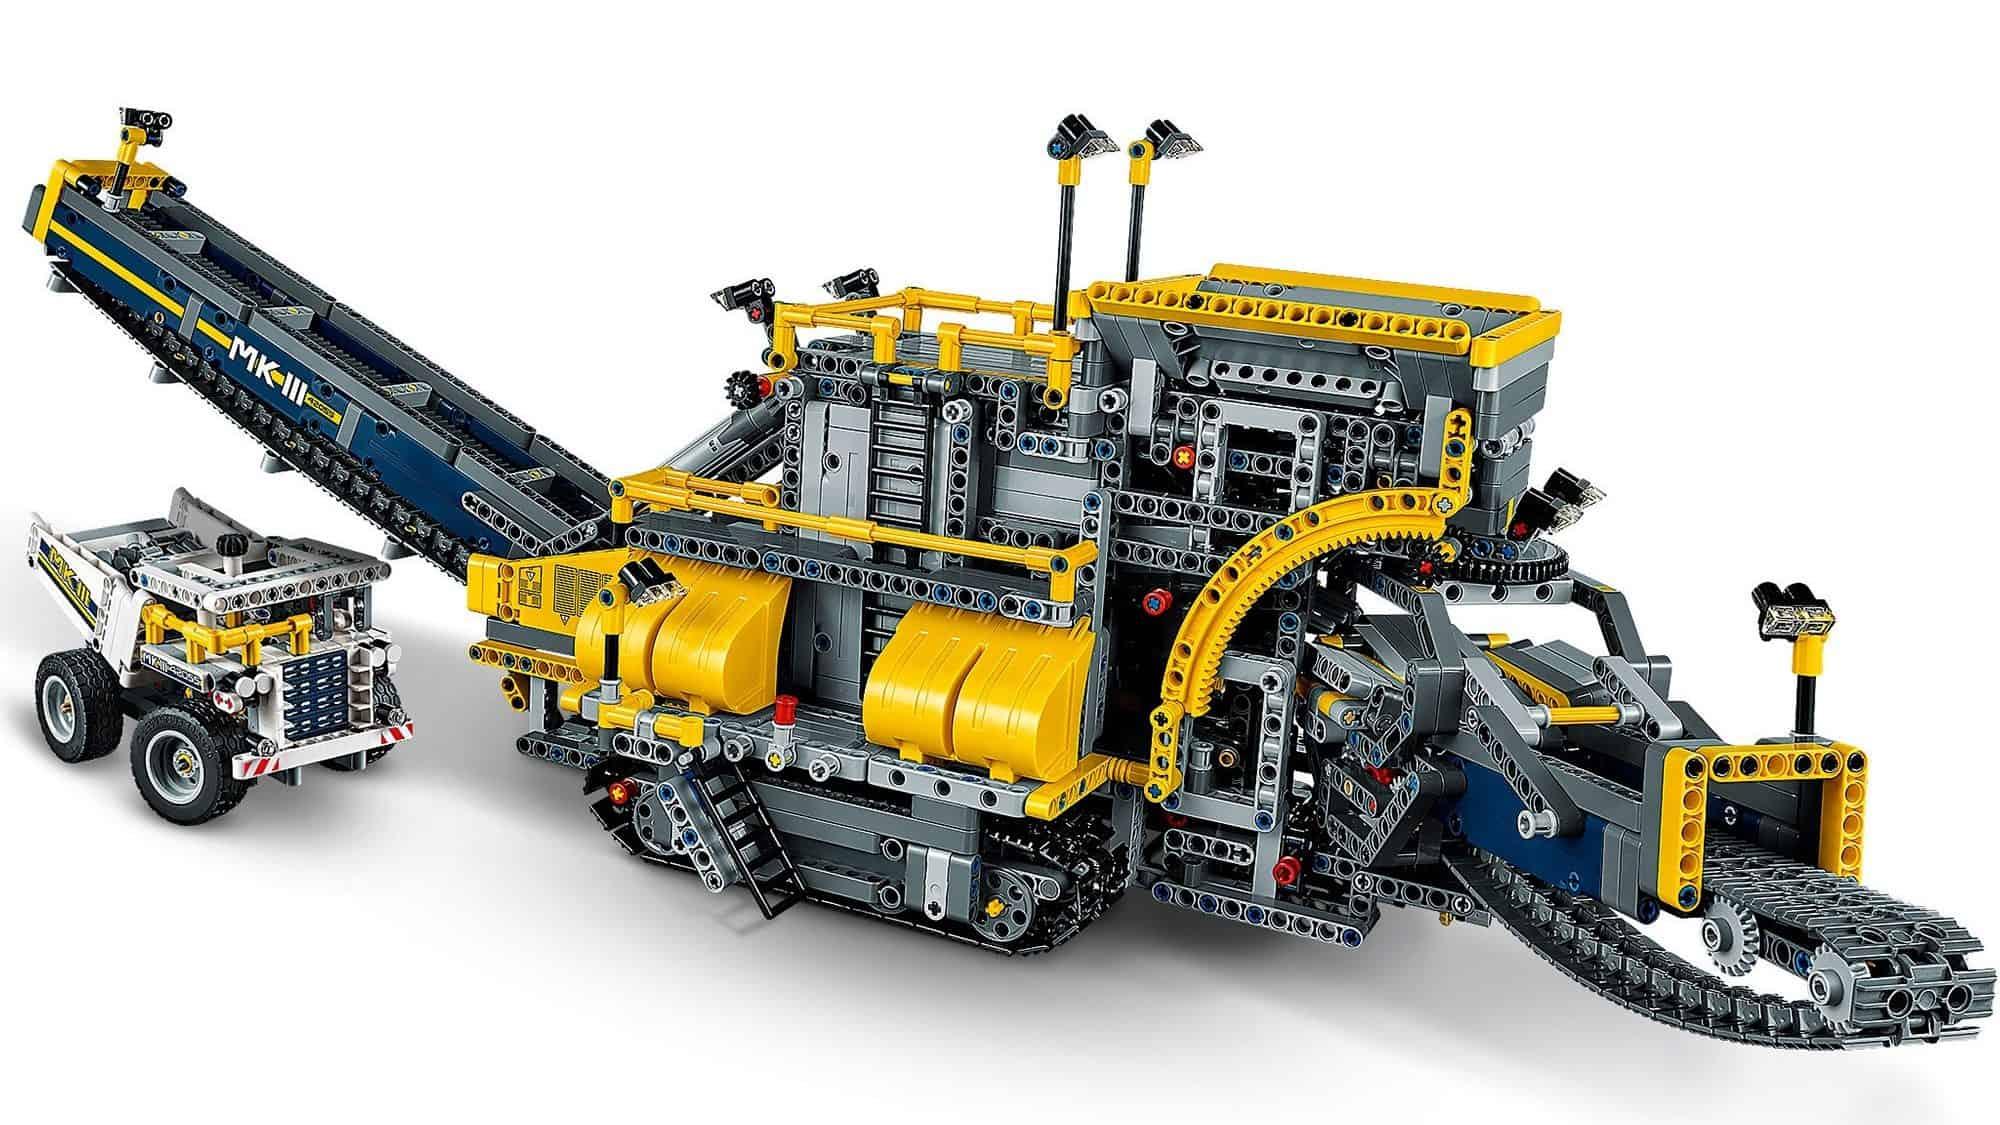 LEGO Technic Mobile Aggregate Processing Plant 42055